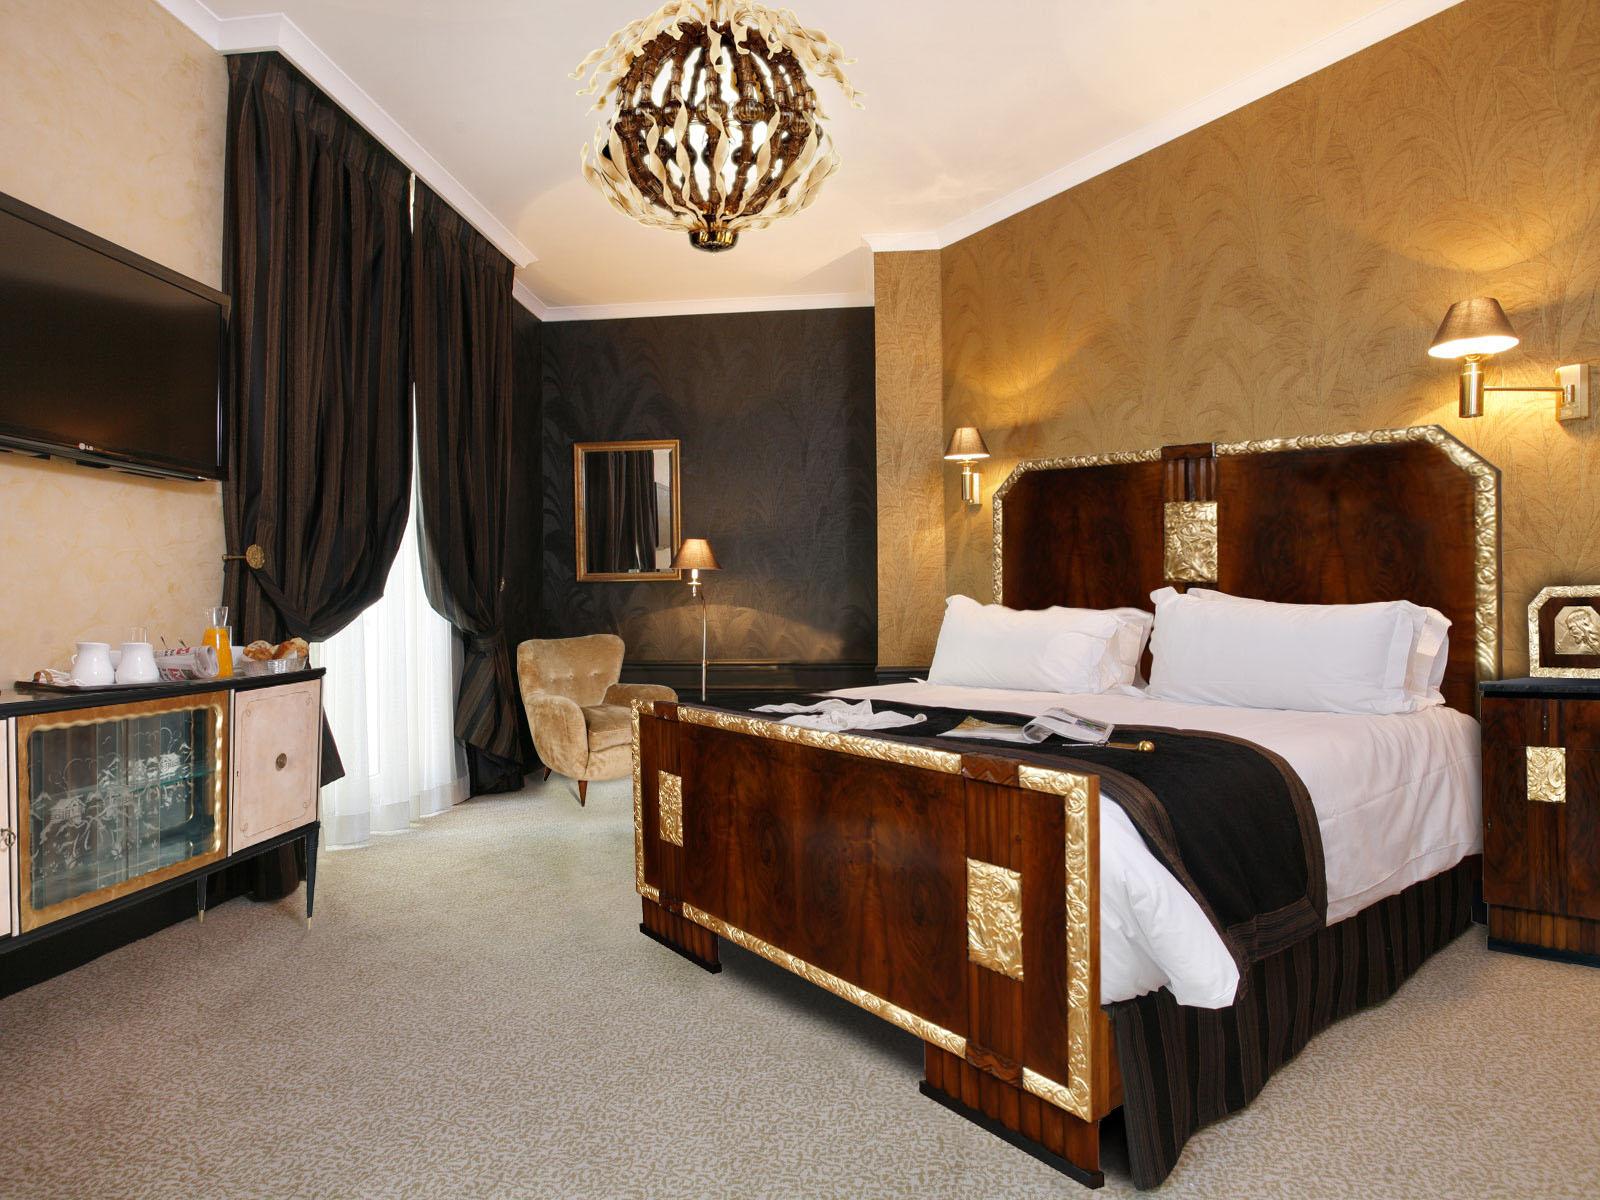 Bedroom Decorating Ideas Art Deco